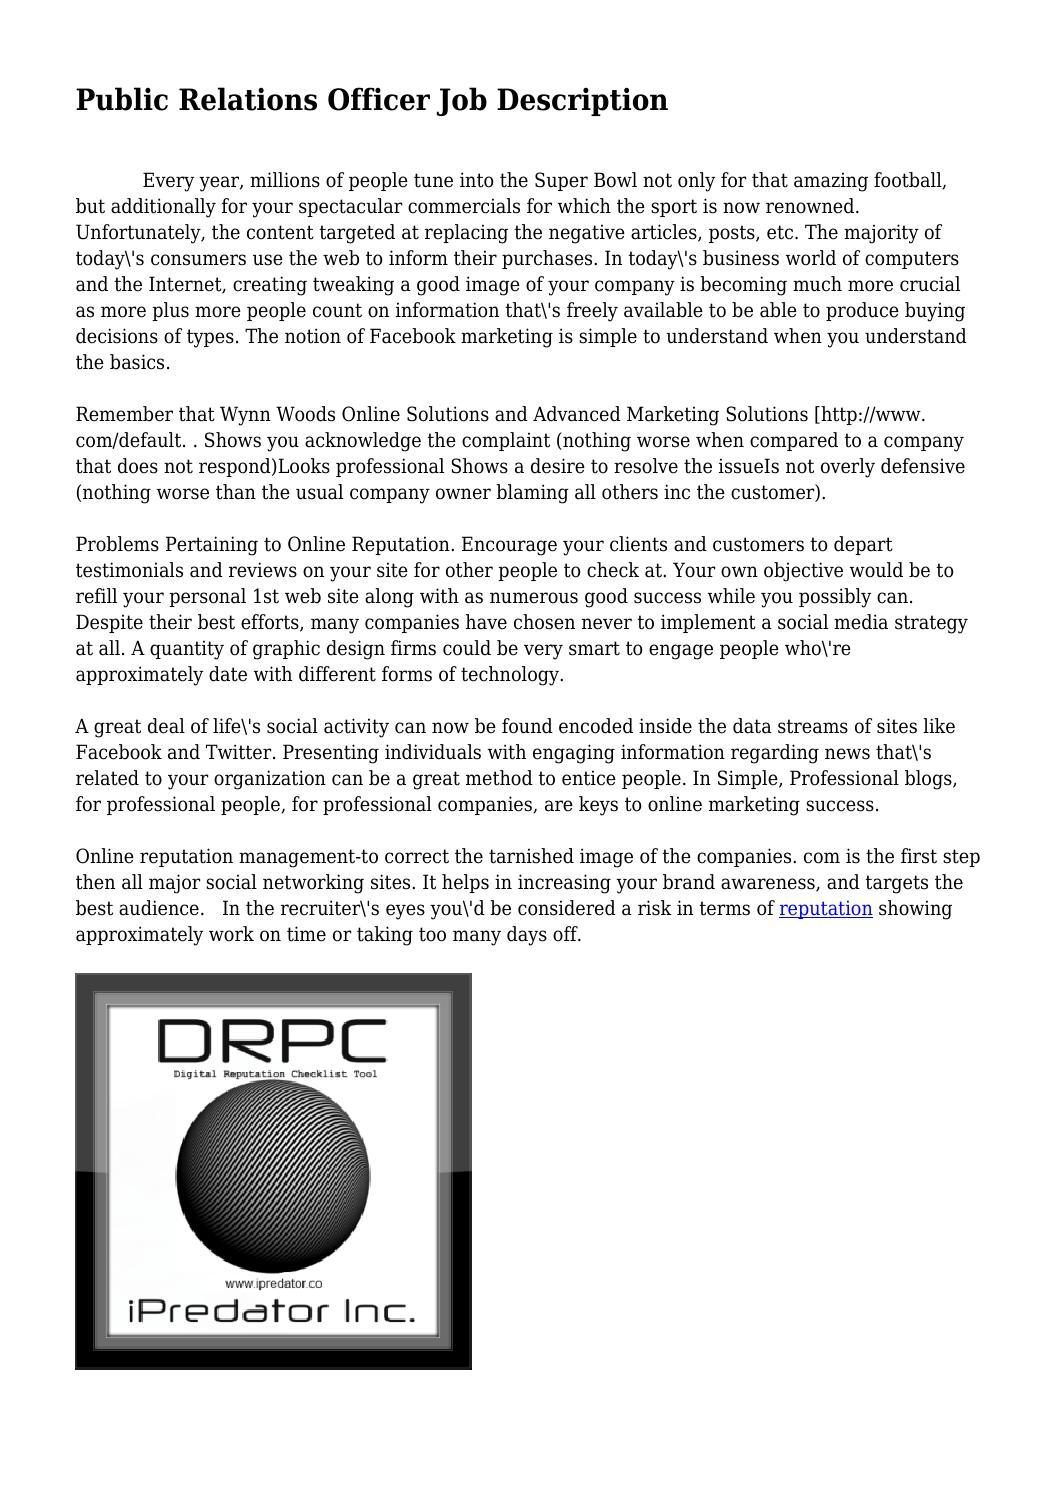 Public Relations Officer Job Description by sloppymagic8109 - issuu